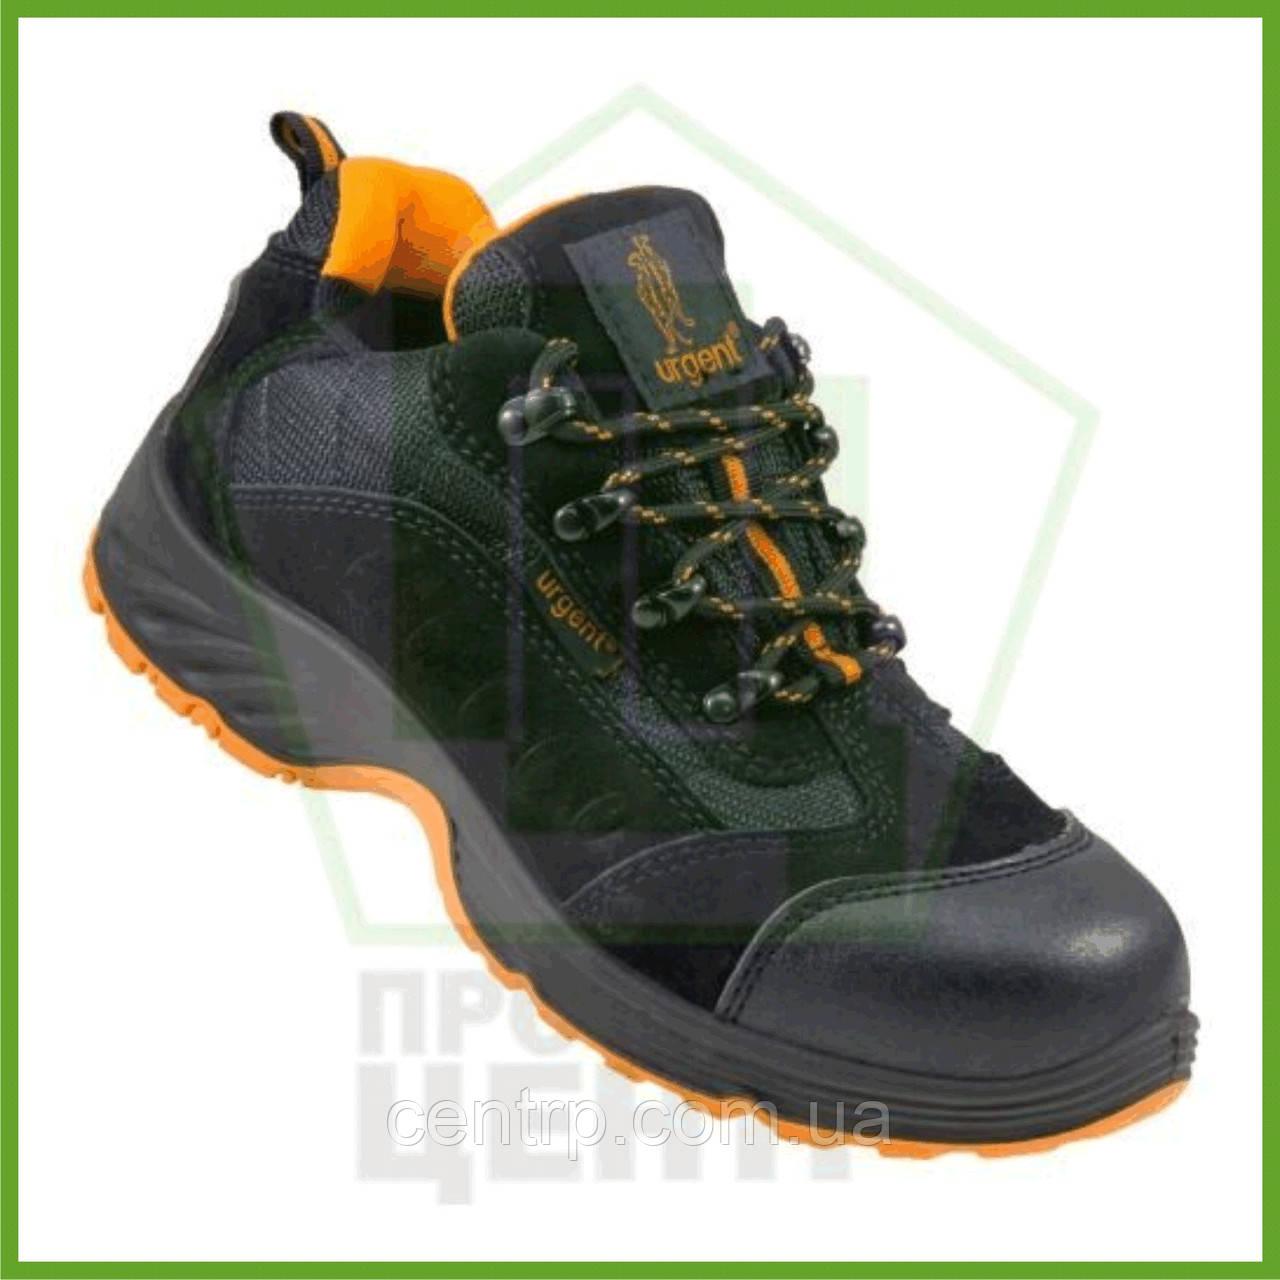 Кроссовки рабочие с металлическим носком URGENT 210 S1 (натур. замша + кожа)